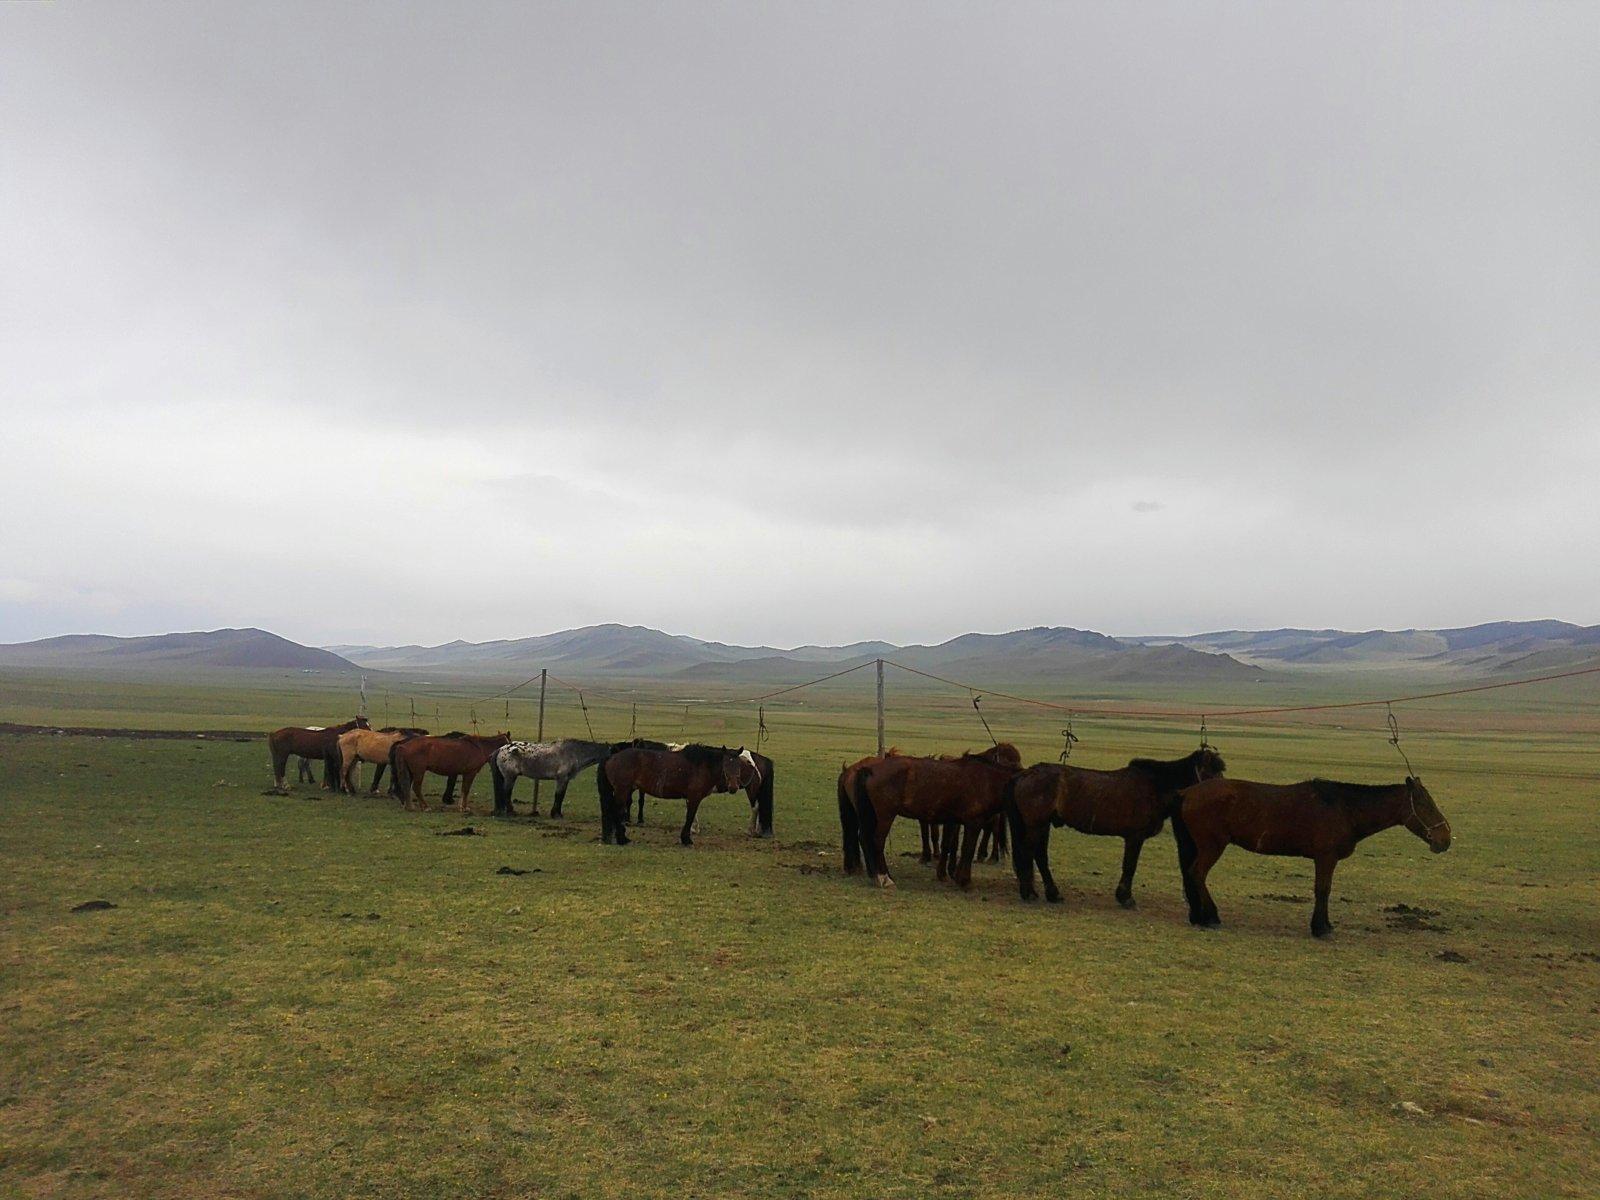 img_20160523_154825-jpg.30637_Mongolia Rainbow Horse Caravan_Travel Stories_Squat the Planet_4:14 AM